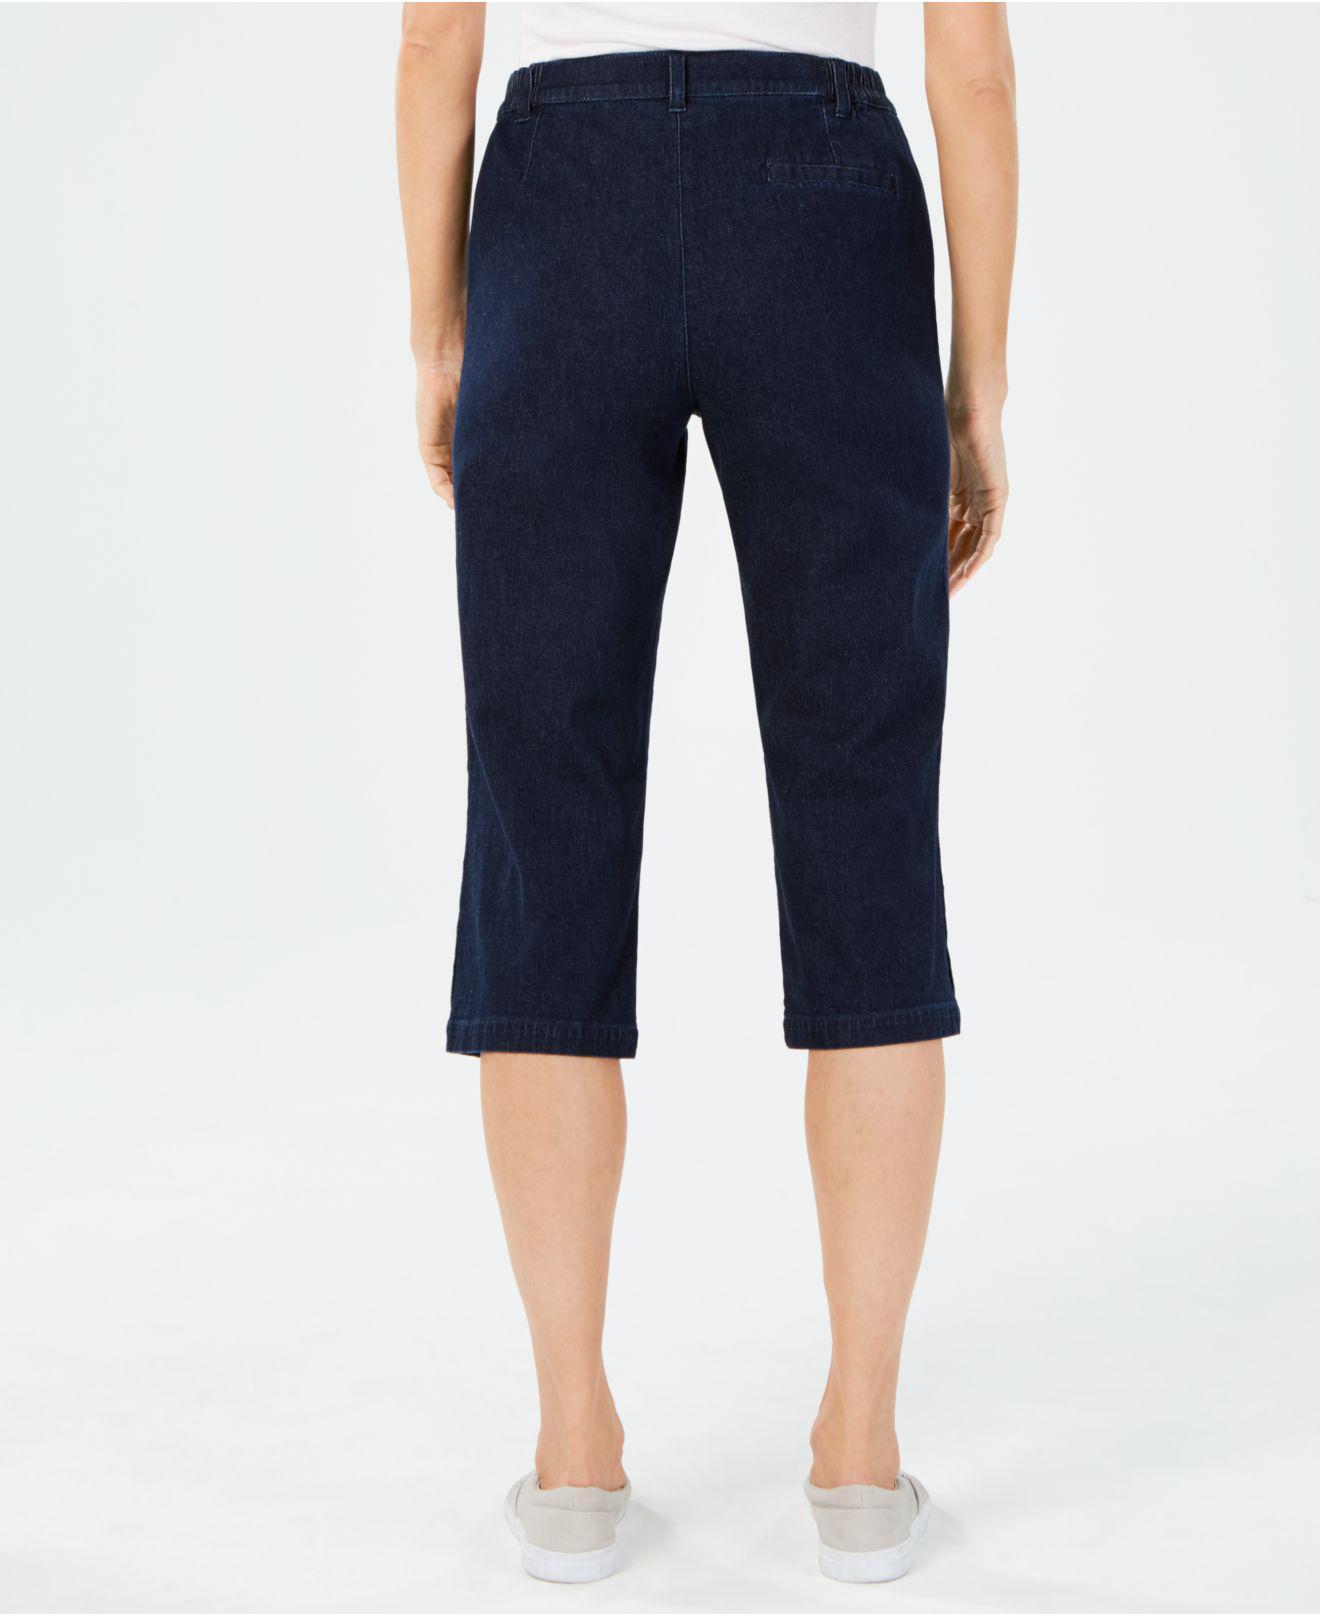 7937cf86383 Lyst - Karen Scott Petite Denim Capri Pants